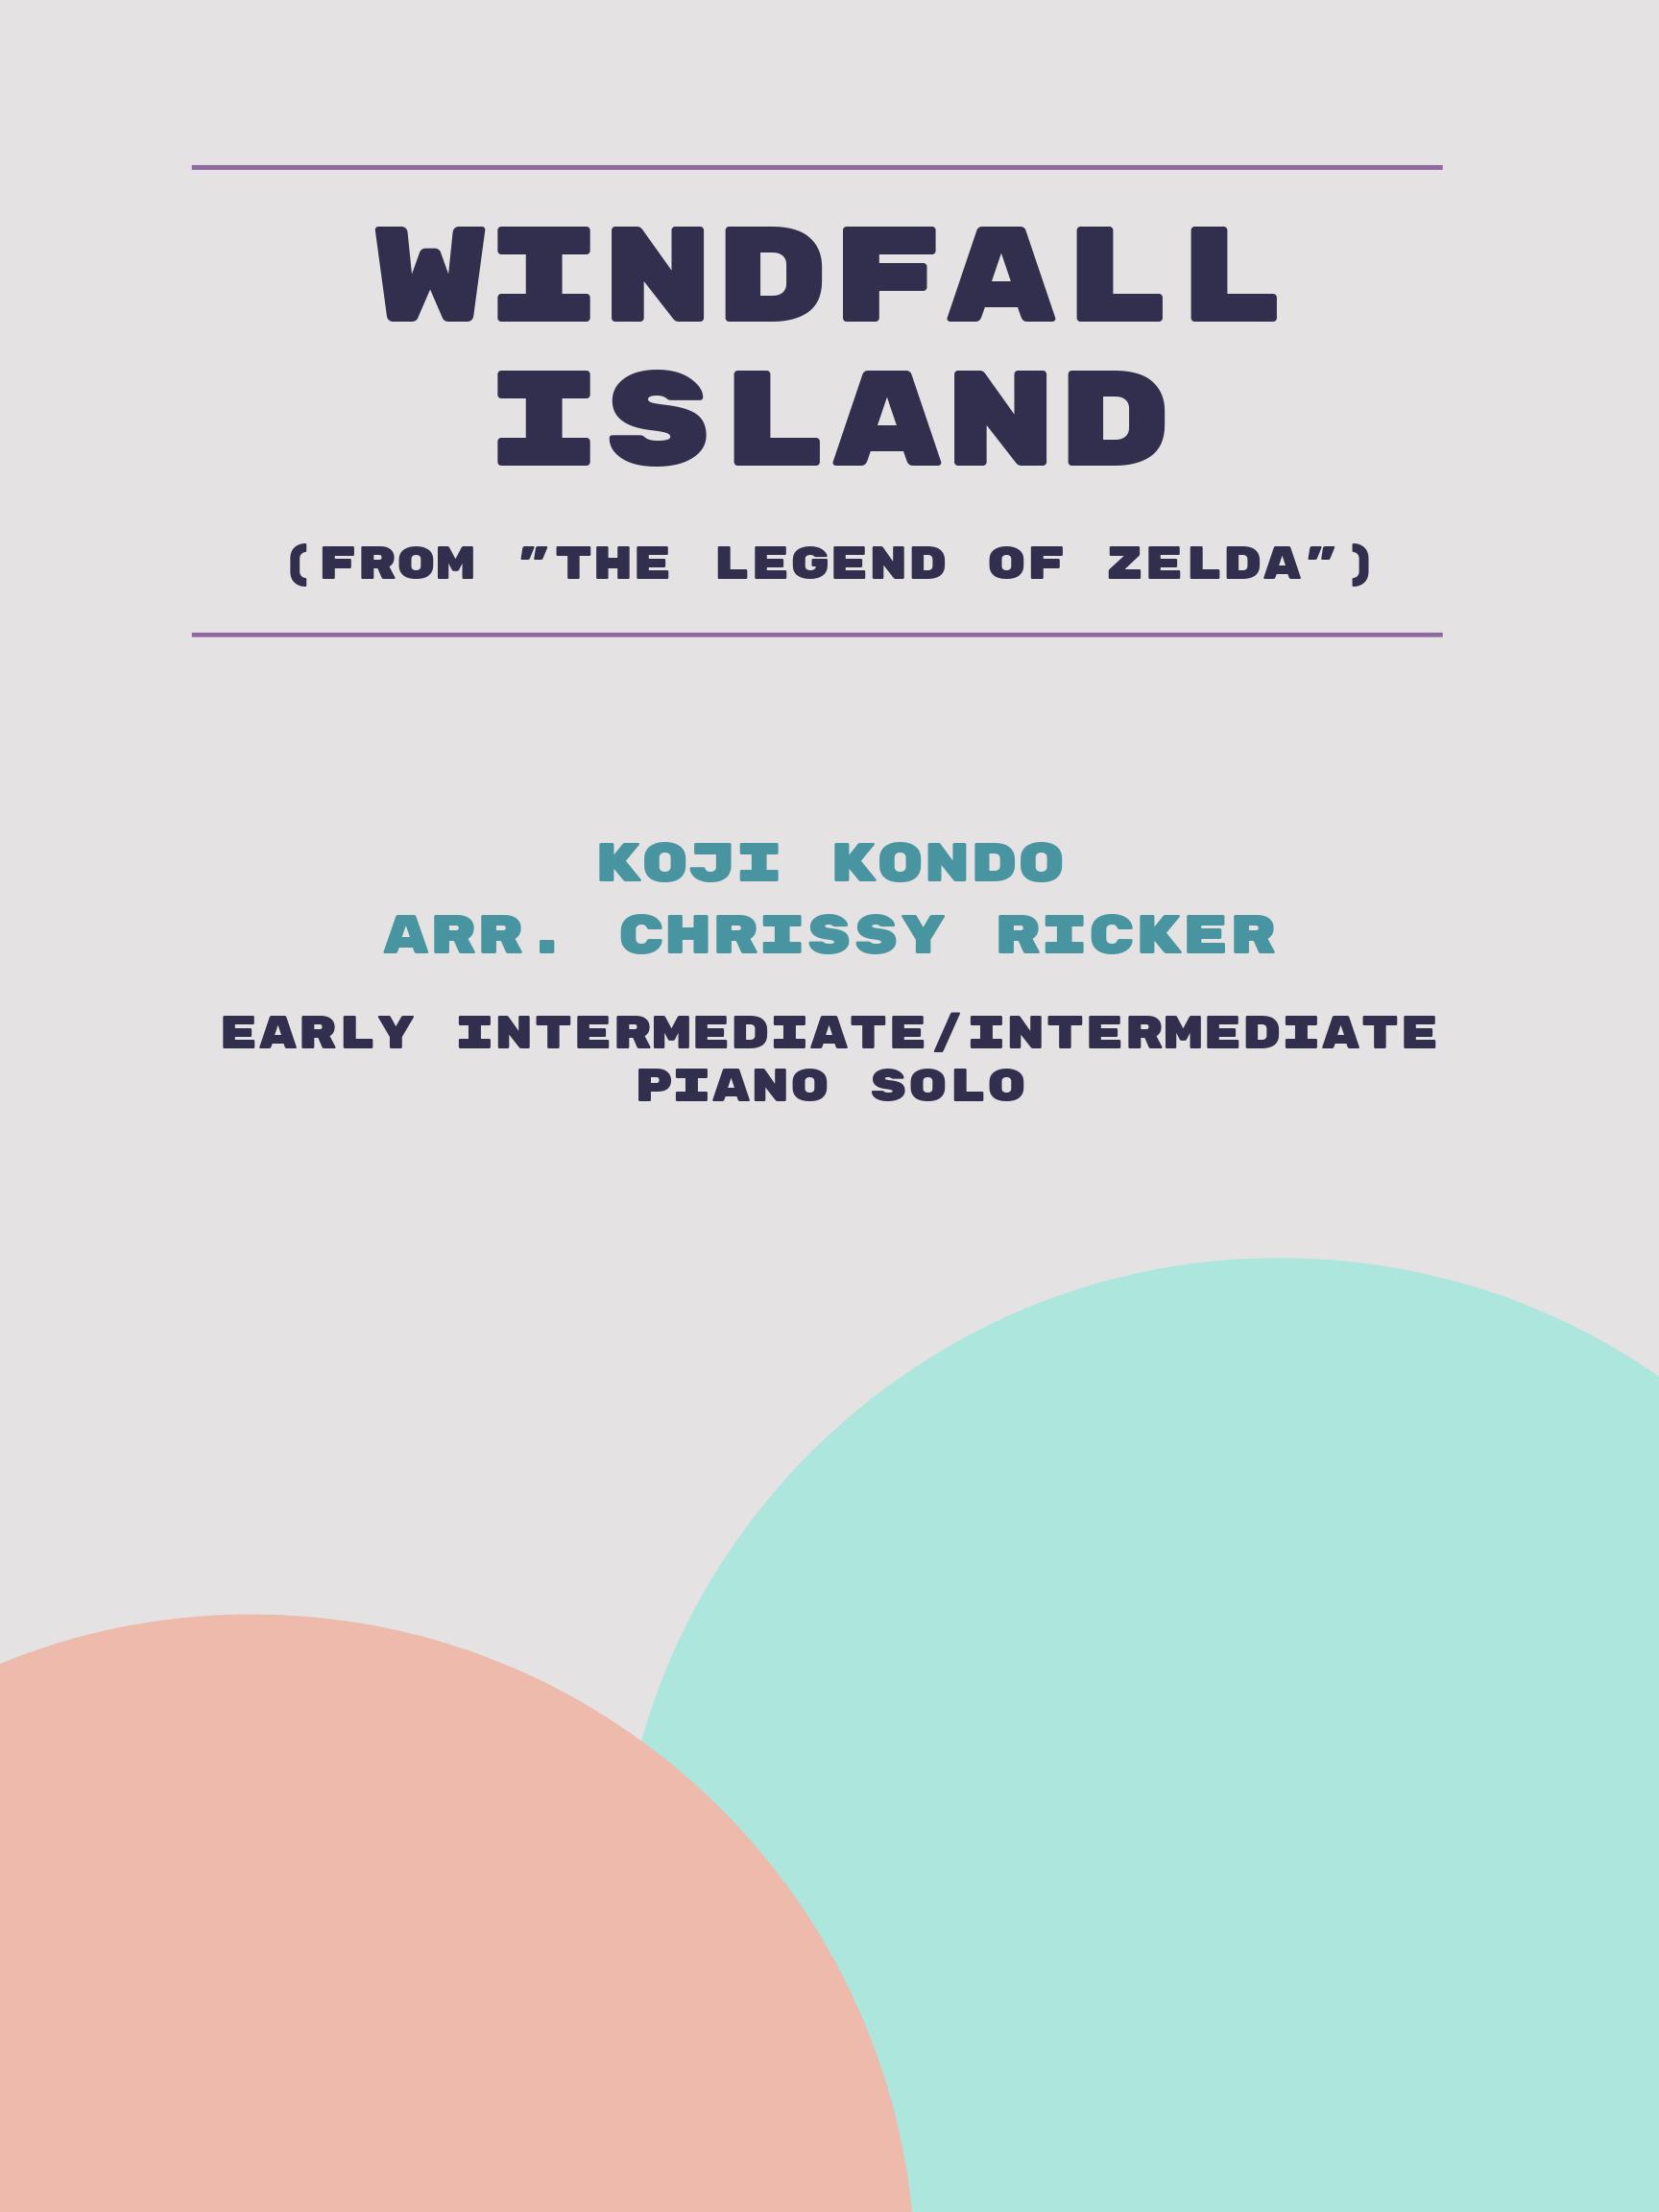 Windfall Island by Koji Kondo